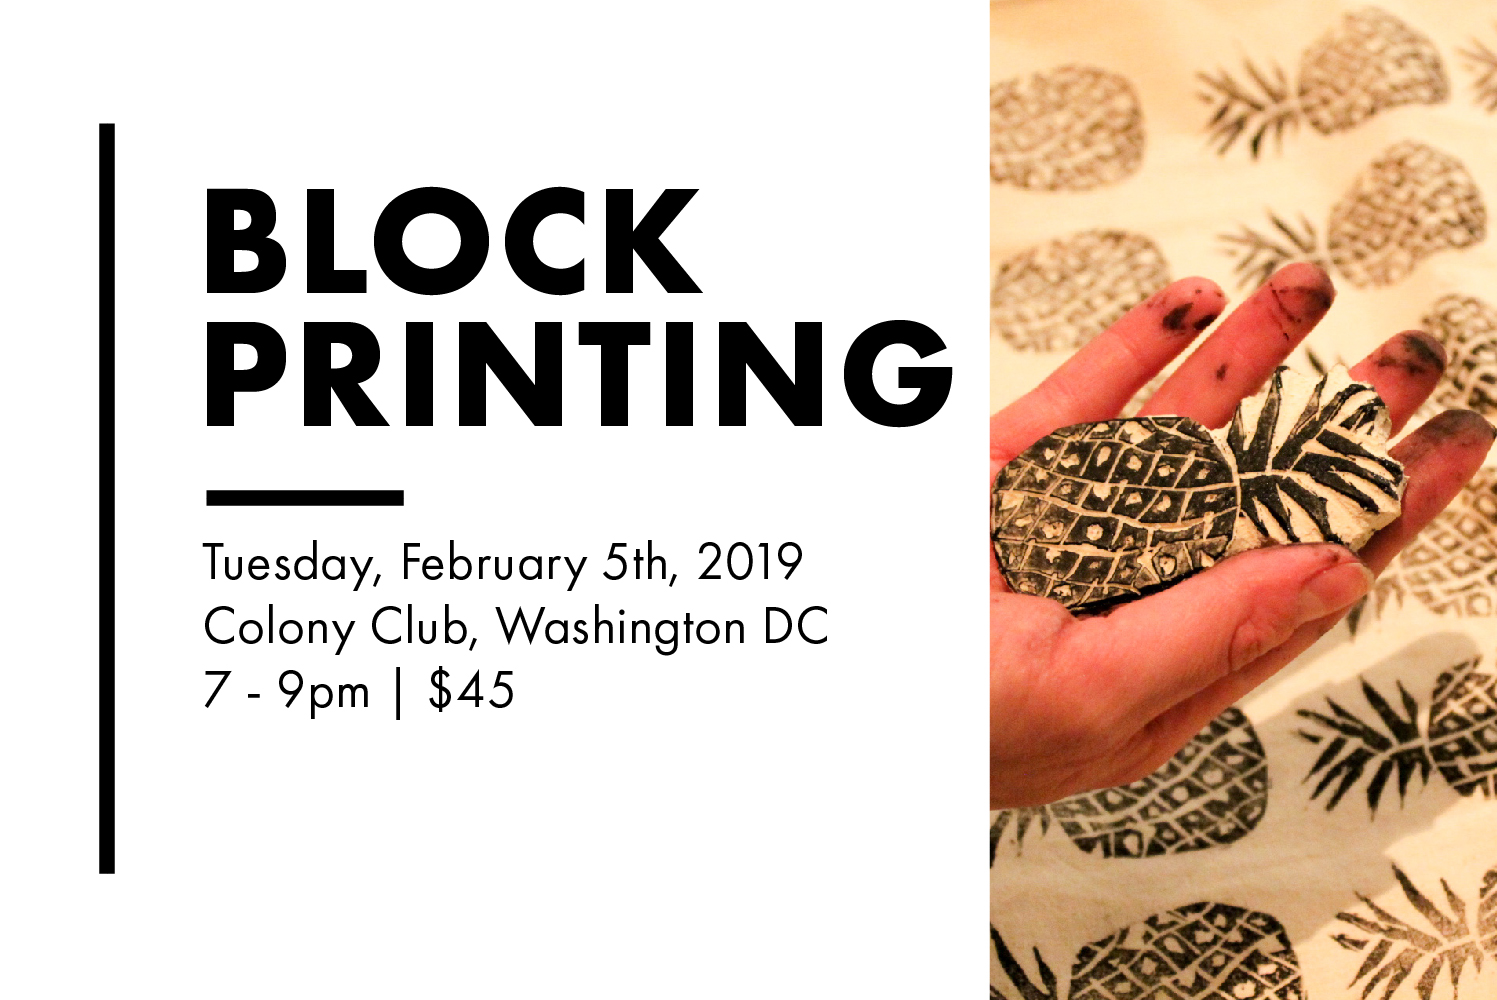 Block Printing Feature Image Template1000.jpg